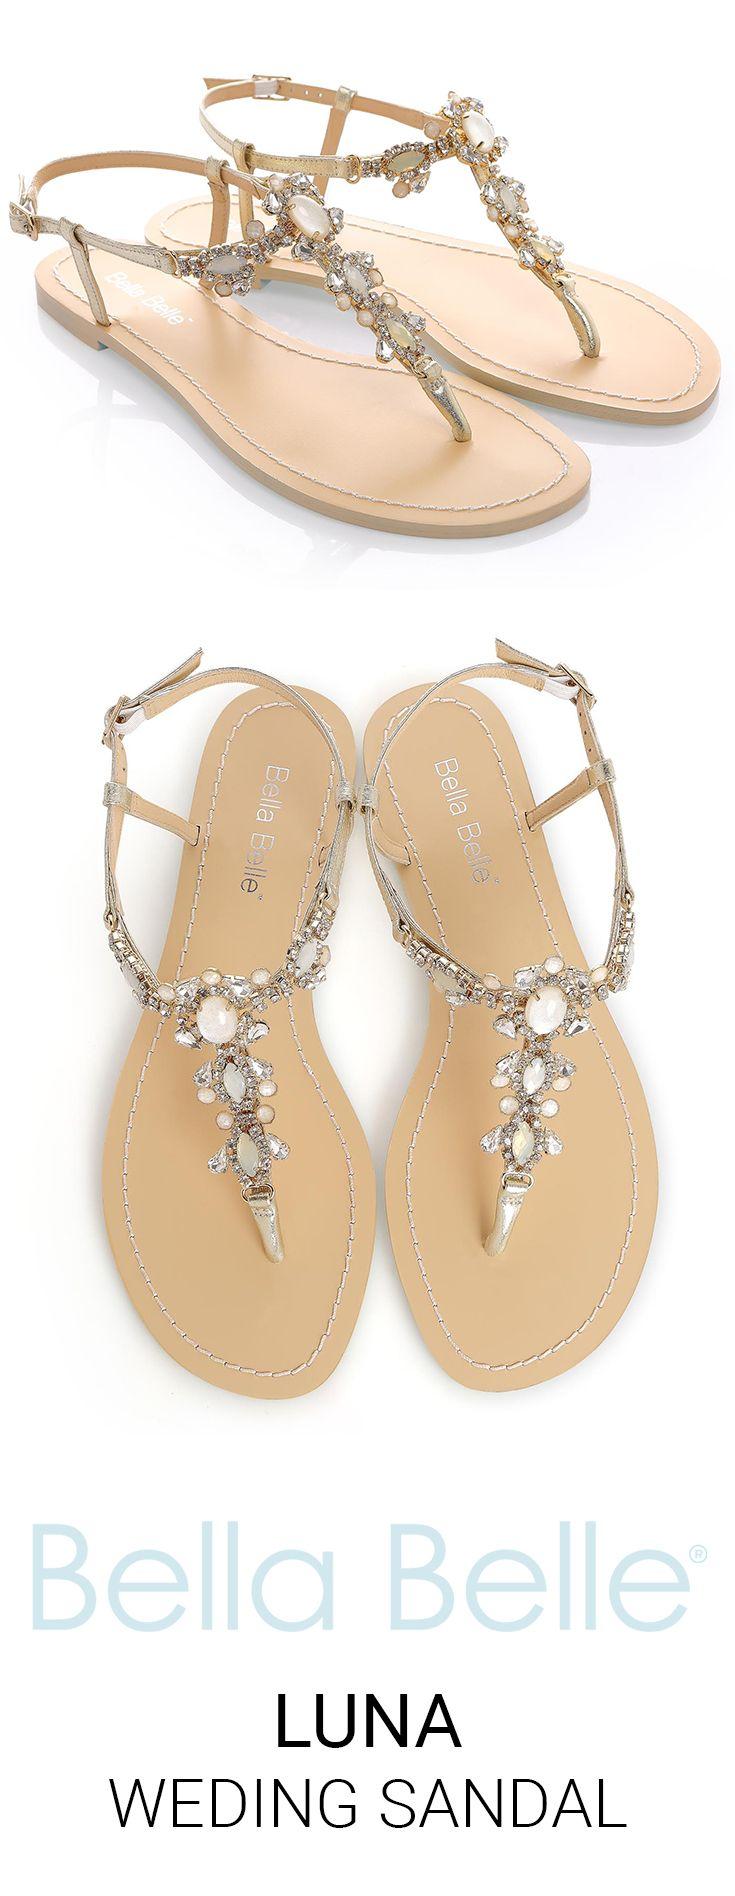 623c6289b3682 Crystal Jewel Gold Dress Sandals in 2019